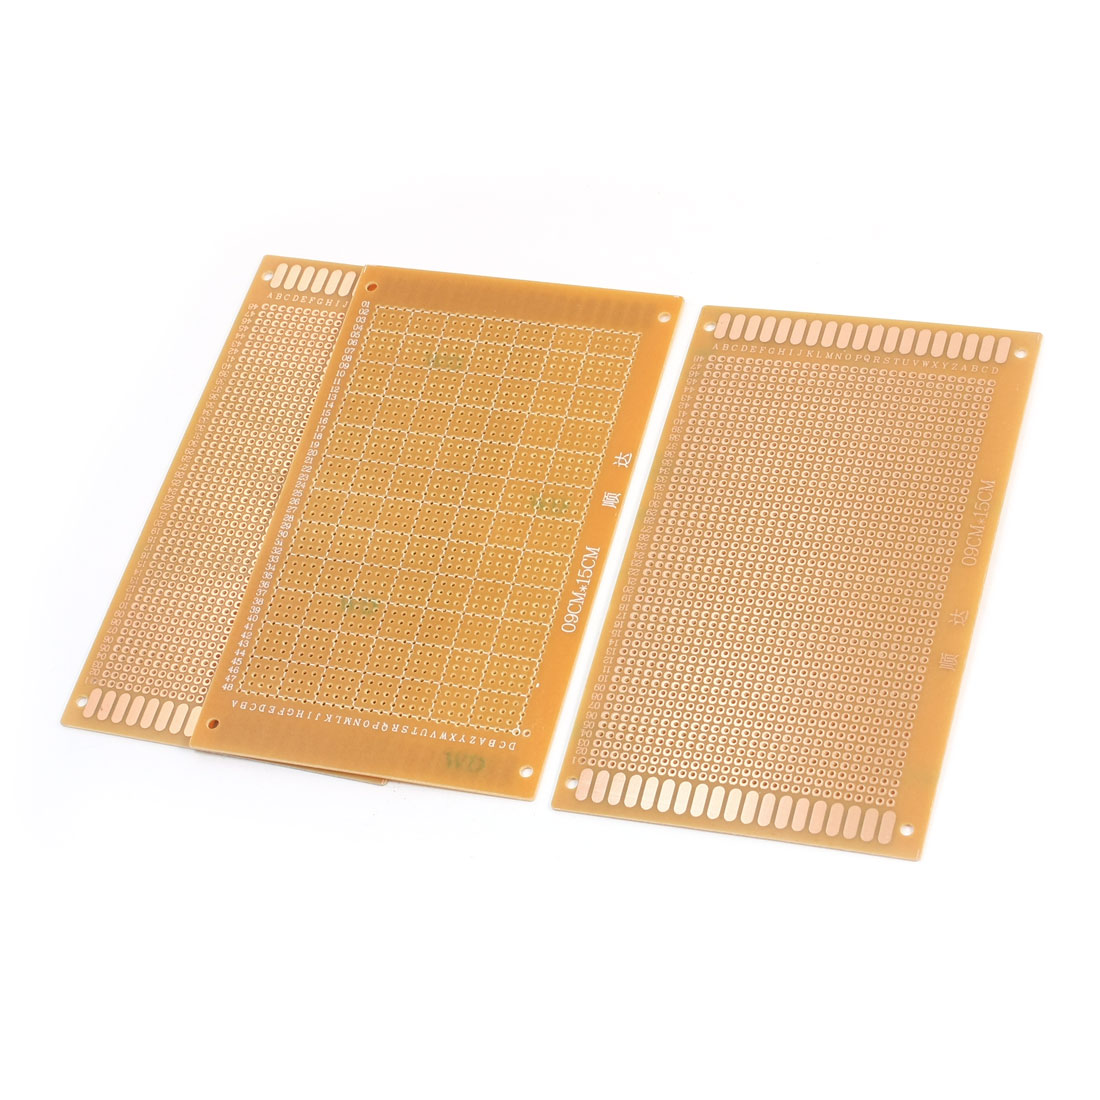 3pcs DIY FR-4 Universal Prototype Solderable PCB Circuit Board 9 x 15cm